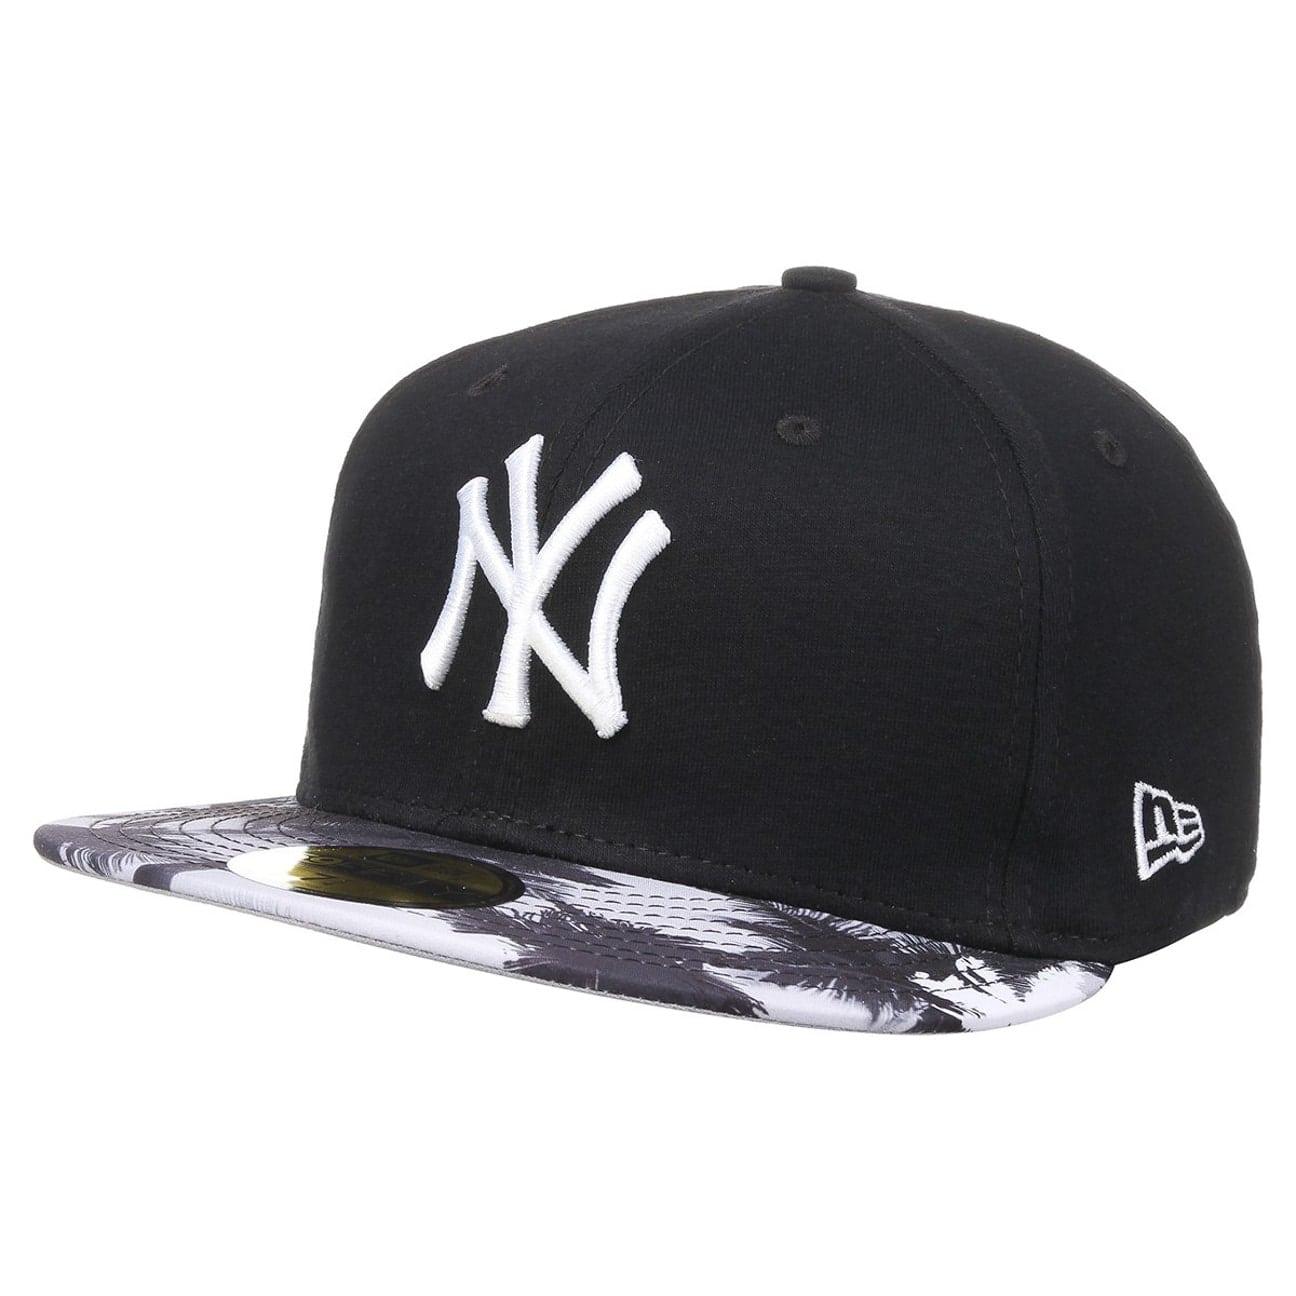 12a5b55f923c5a ... 59Fifty Miami Vibe Cap by New Era - black 6